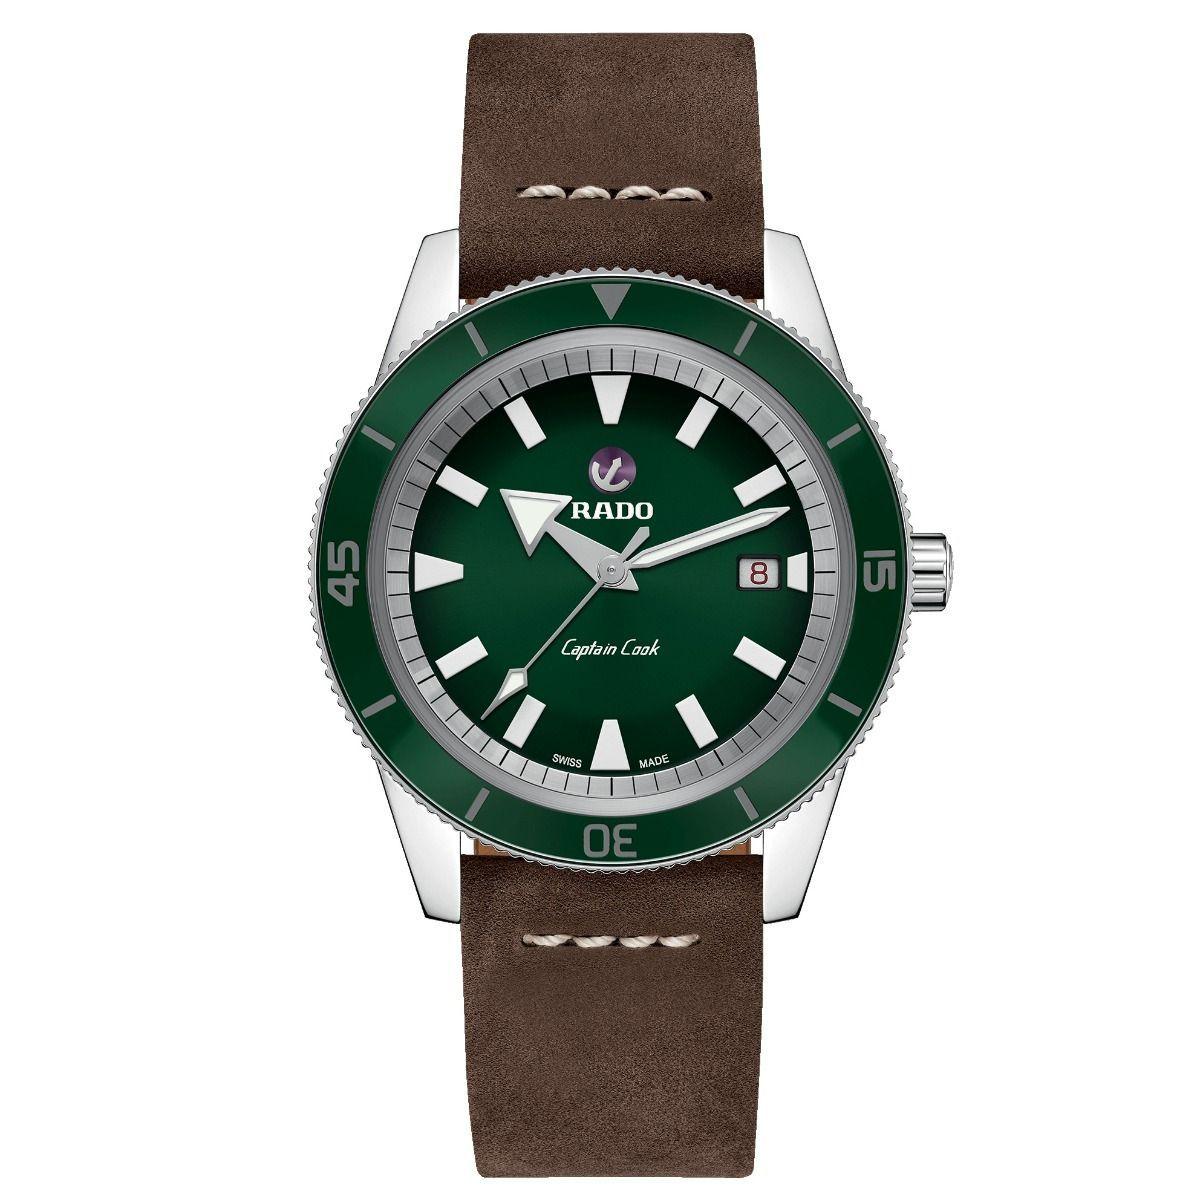 RADO Captain Cook 42MM Mens Watch R32505315 (Special order 6-8 weeks) £900 @ Goldsmiths